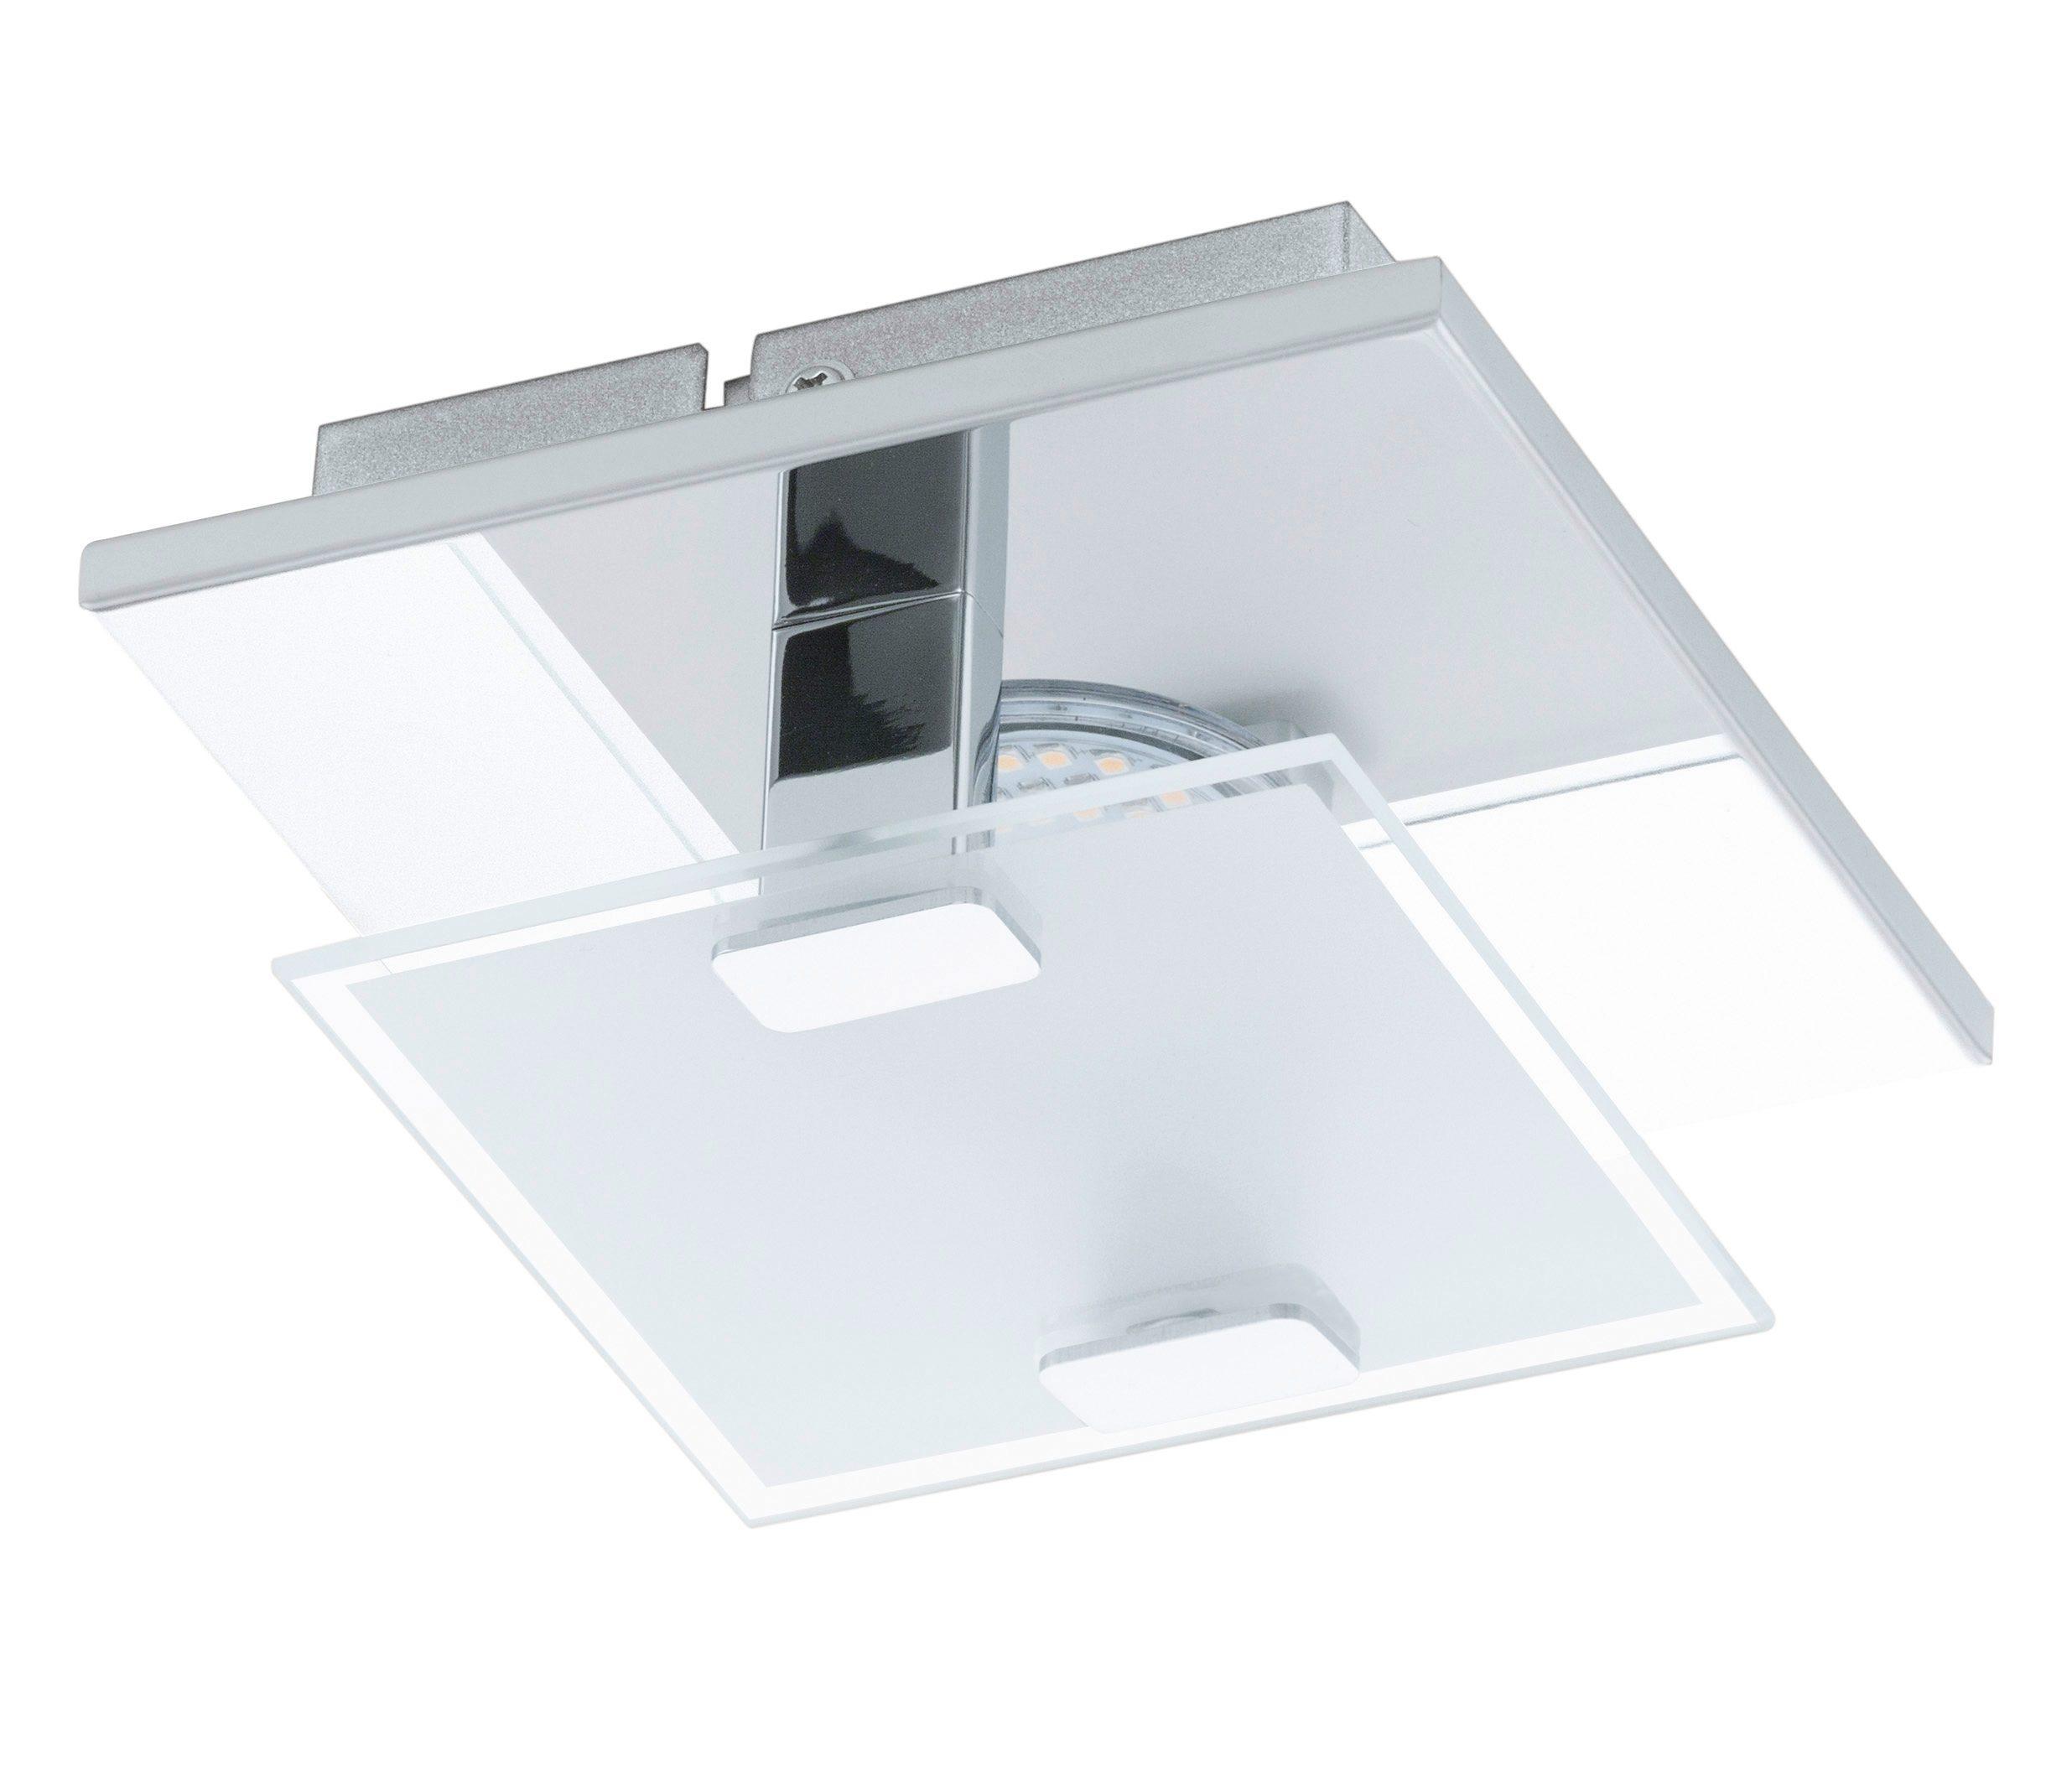 Eglo LED-Wandleuchte / LED-Deckenleuchte, 1flg., »VICARO«